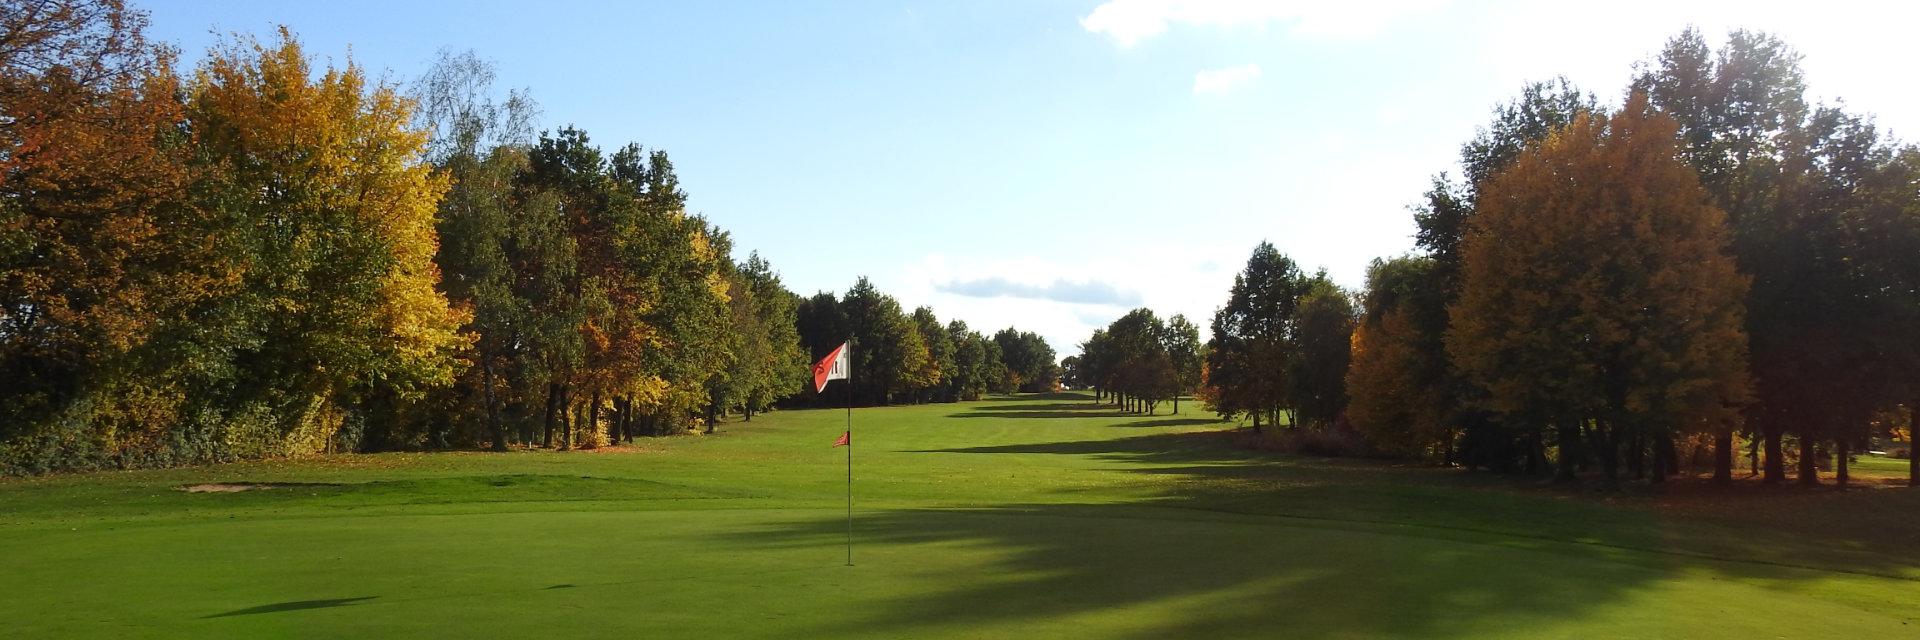 Golfplatz_Herbst_2020_10_24_72_Slider